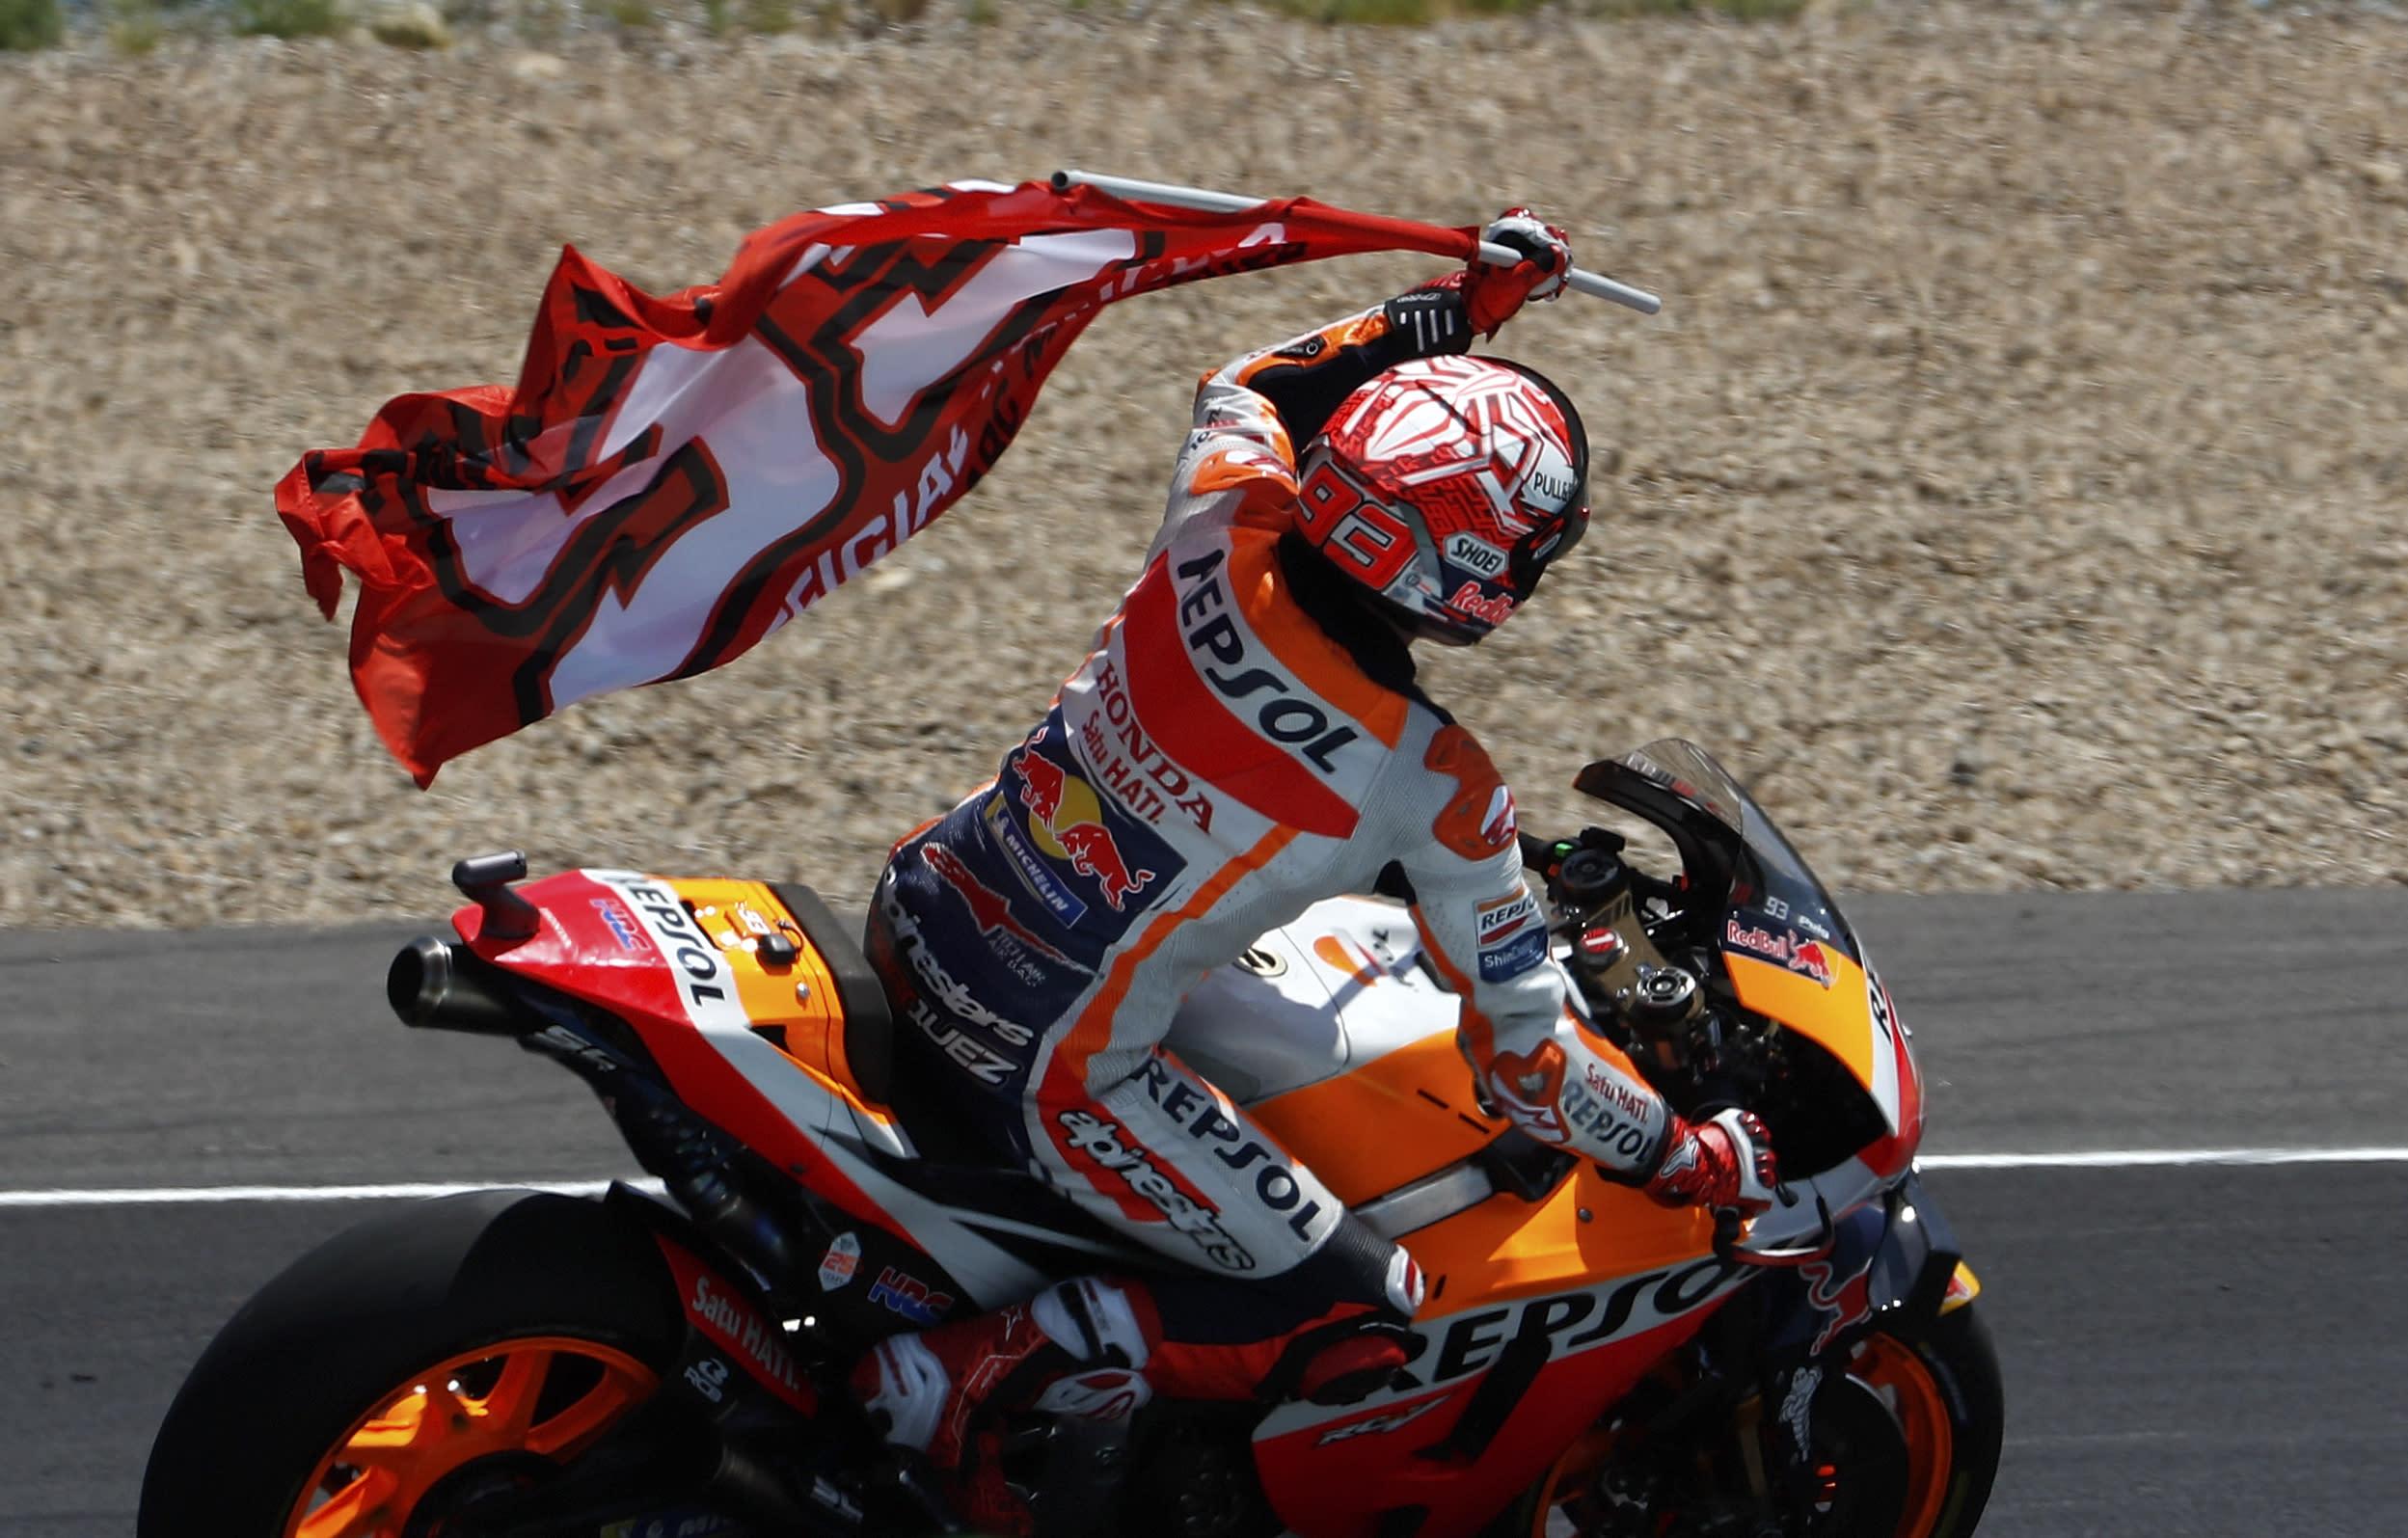 MotoGP rider Marc Marquez of Spain celebrates after winning the Spanish Motorcycle Grand Prix at the Angel Nieto racetrack in Jerez de la Frontera, Spain, Sunday, May 5, 2019. (AP Photo/Miguel Morenatti)